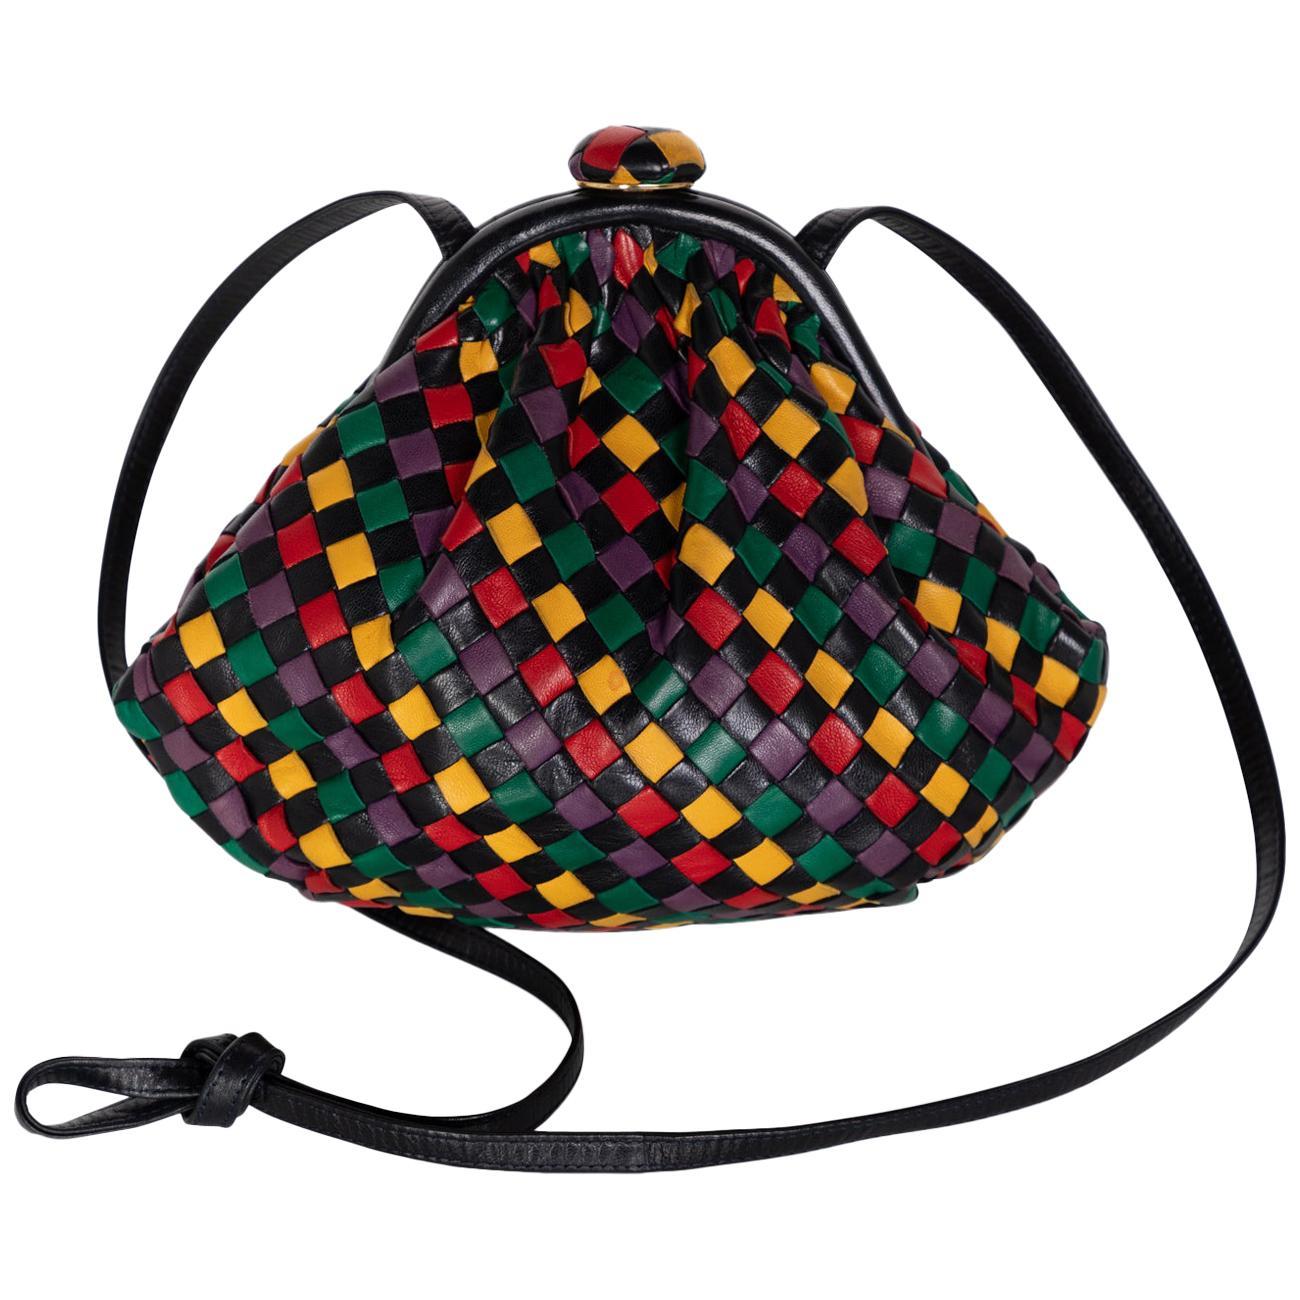 Bottega Veneta Crossbody Bags and Messenger Bags